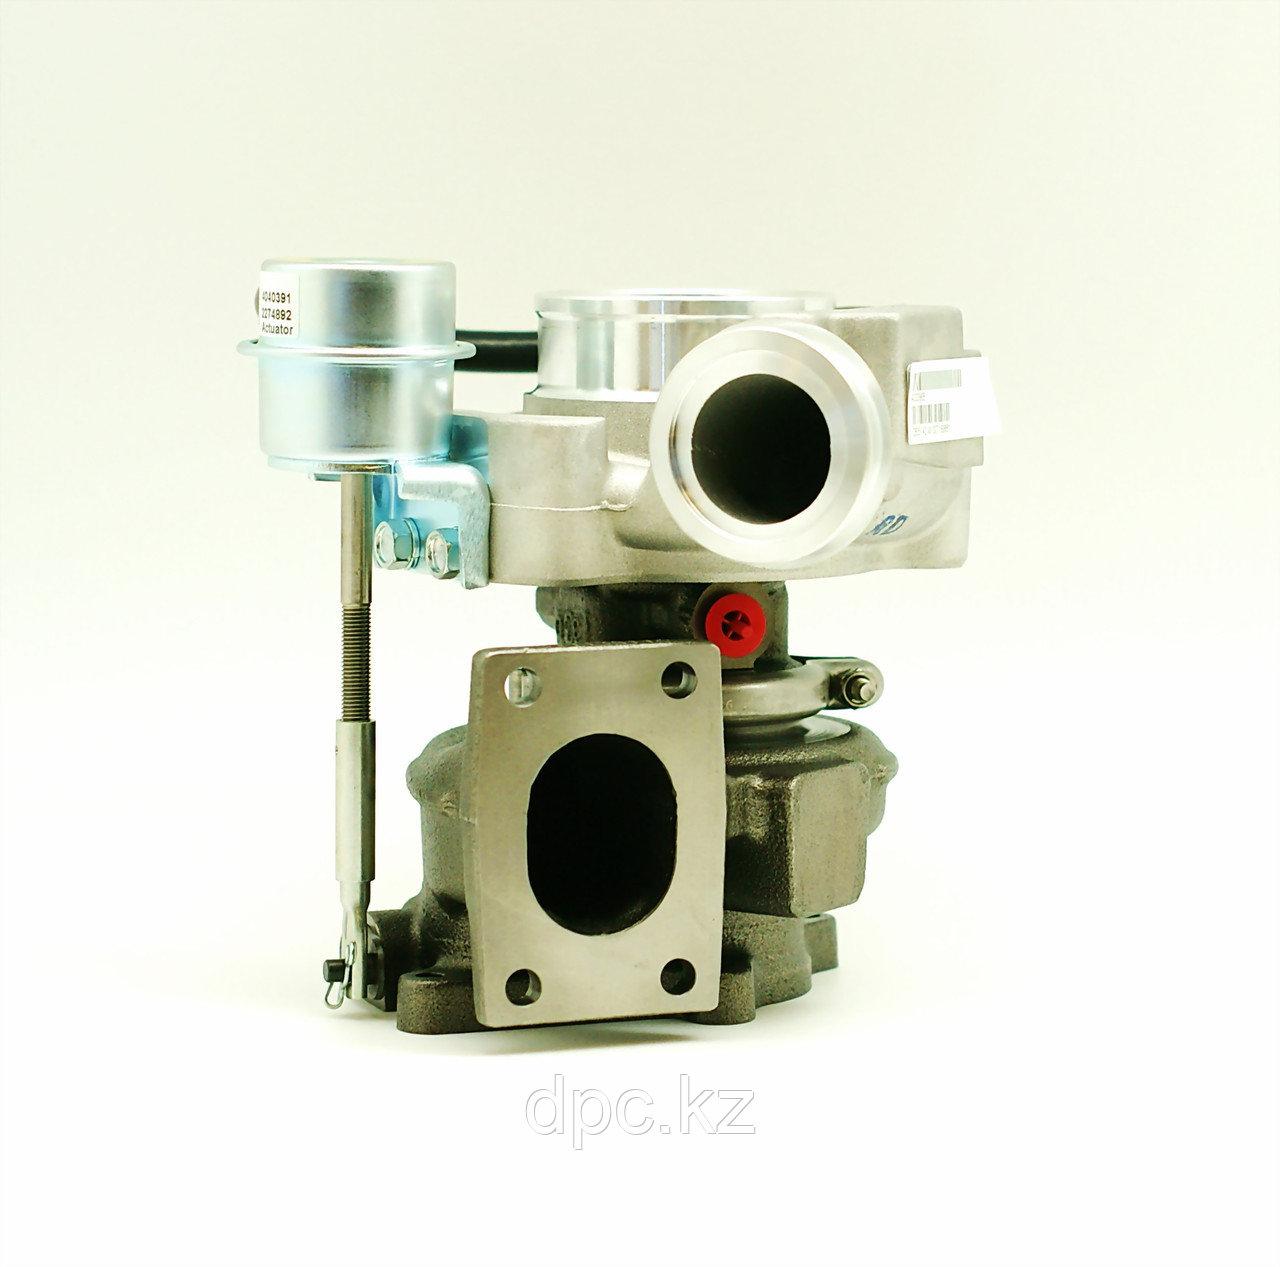 Турбокомпрессор Holset Cummins ISDe ISBe185  (ПАЗ-3204,3206, Yutong ZK6737D) 4043976 2835142 4955962